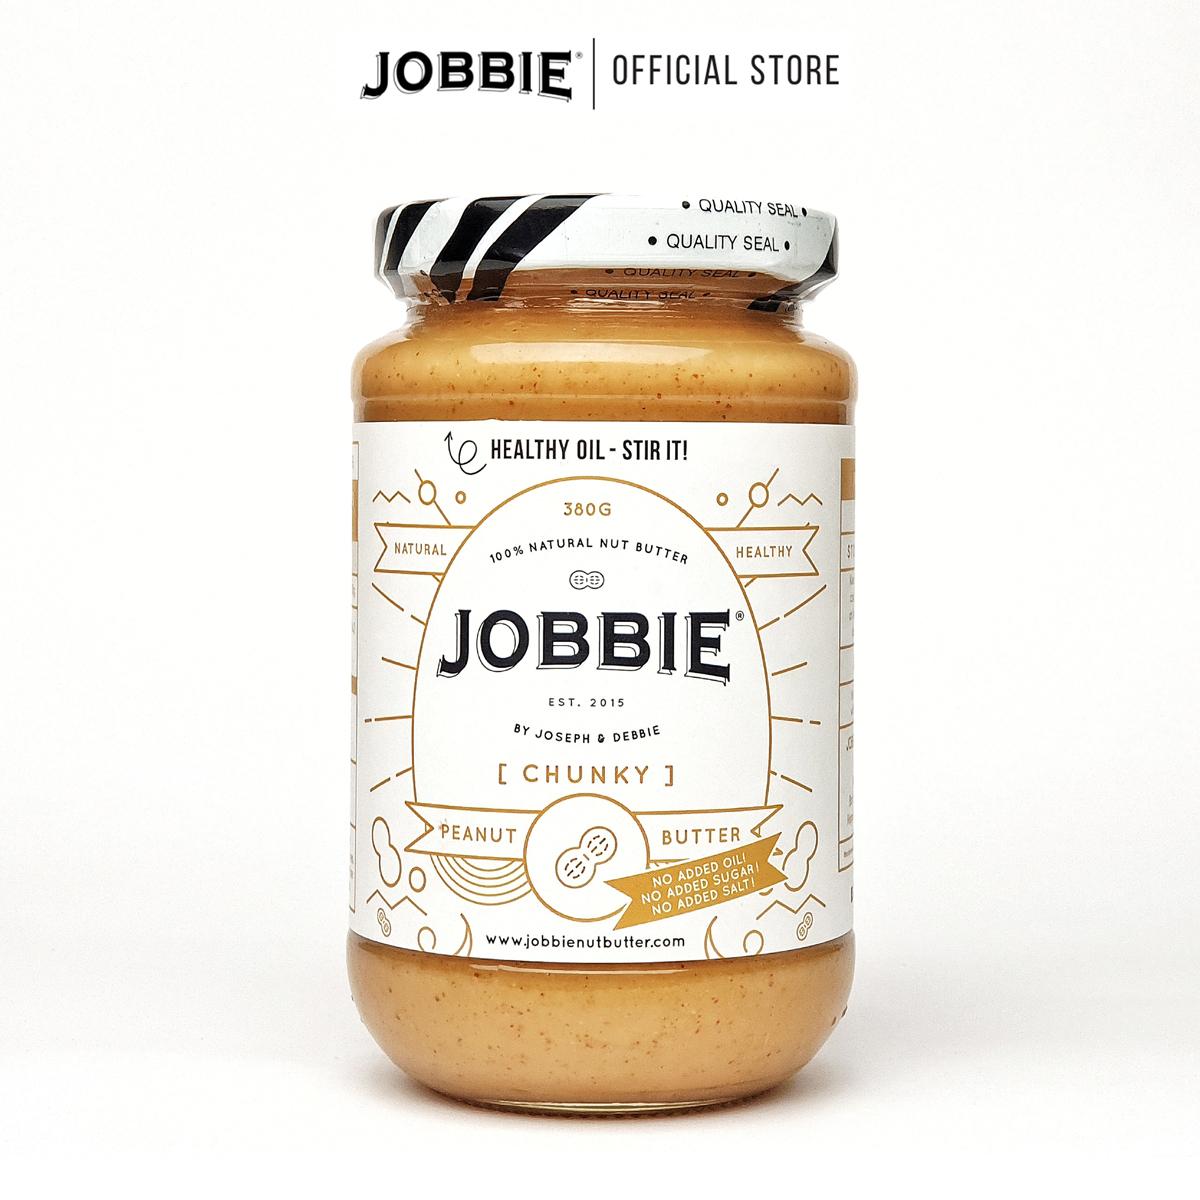 JOBBIE Peanut Butter - Chunky Pure (380g) - NO Sugar & Salt